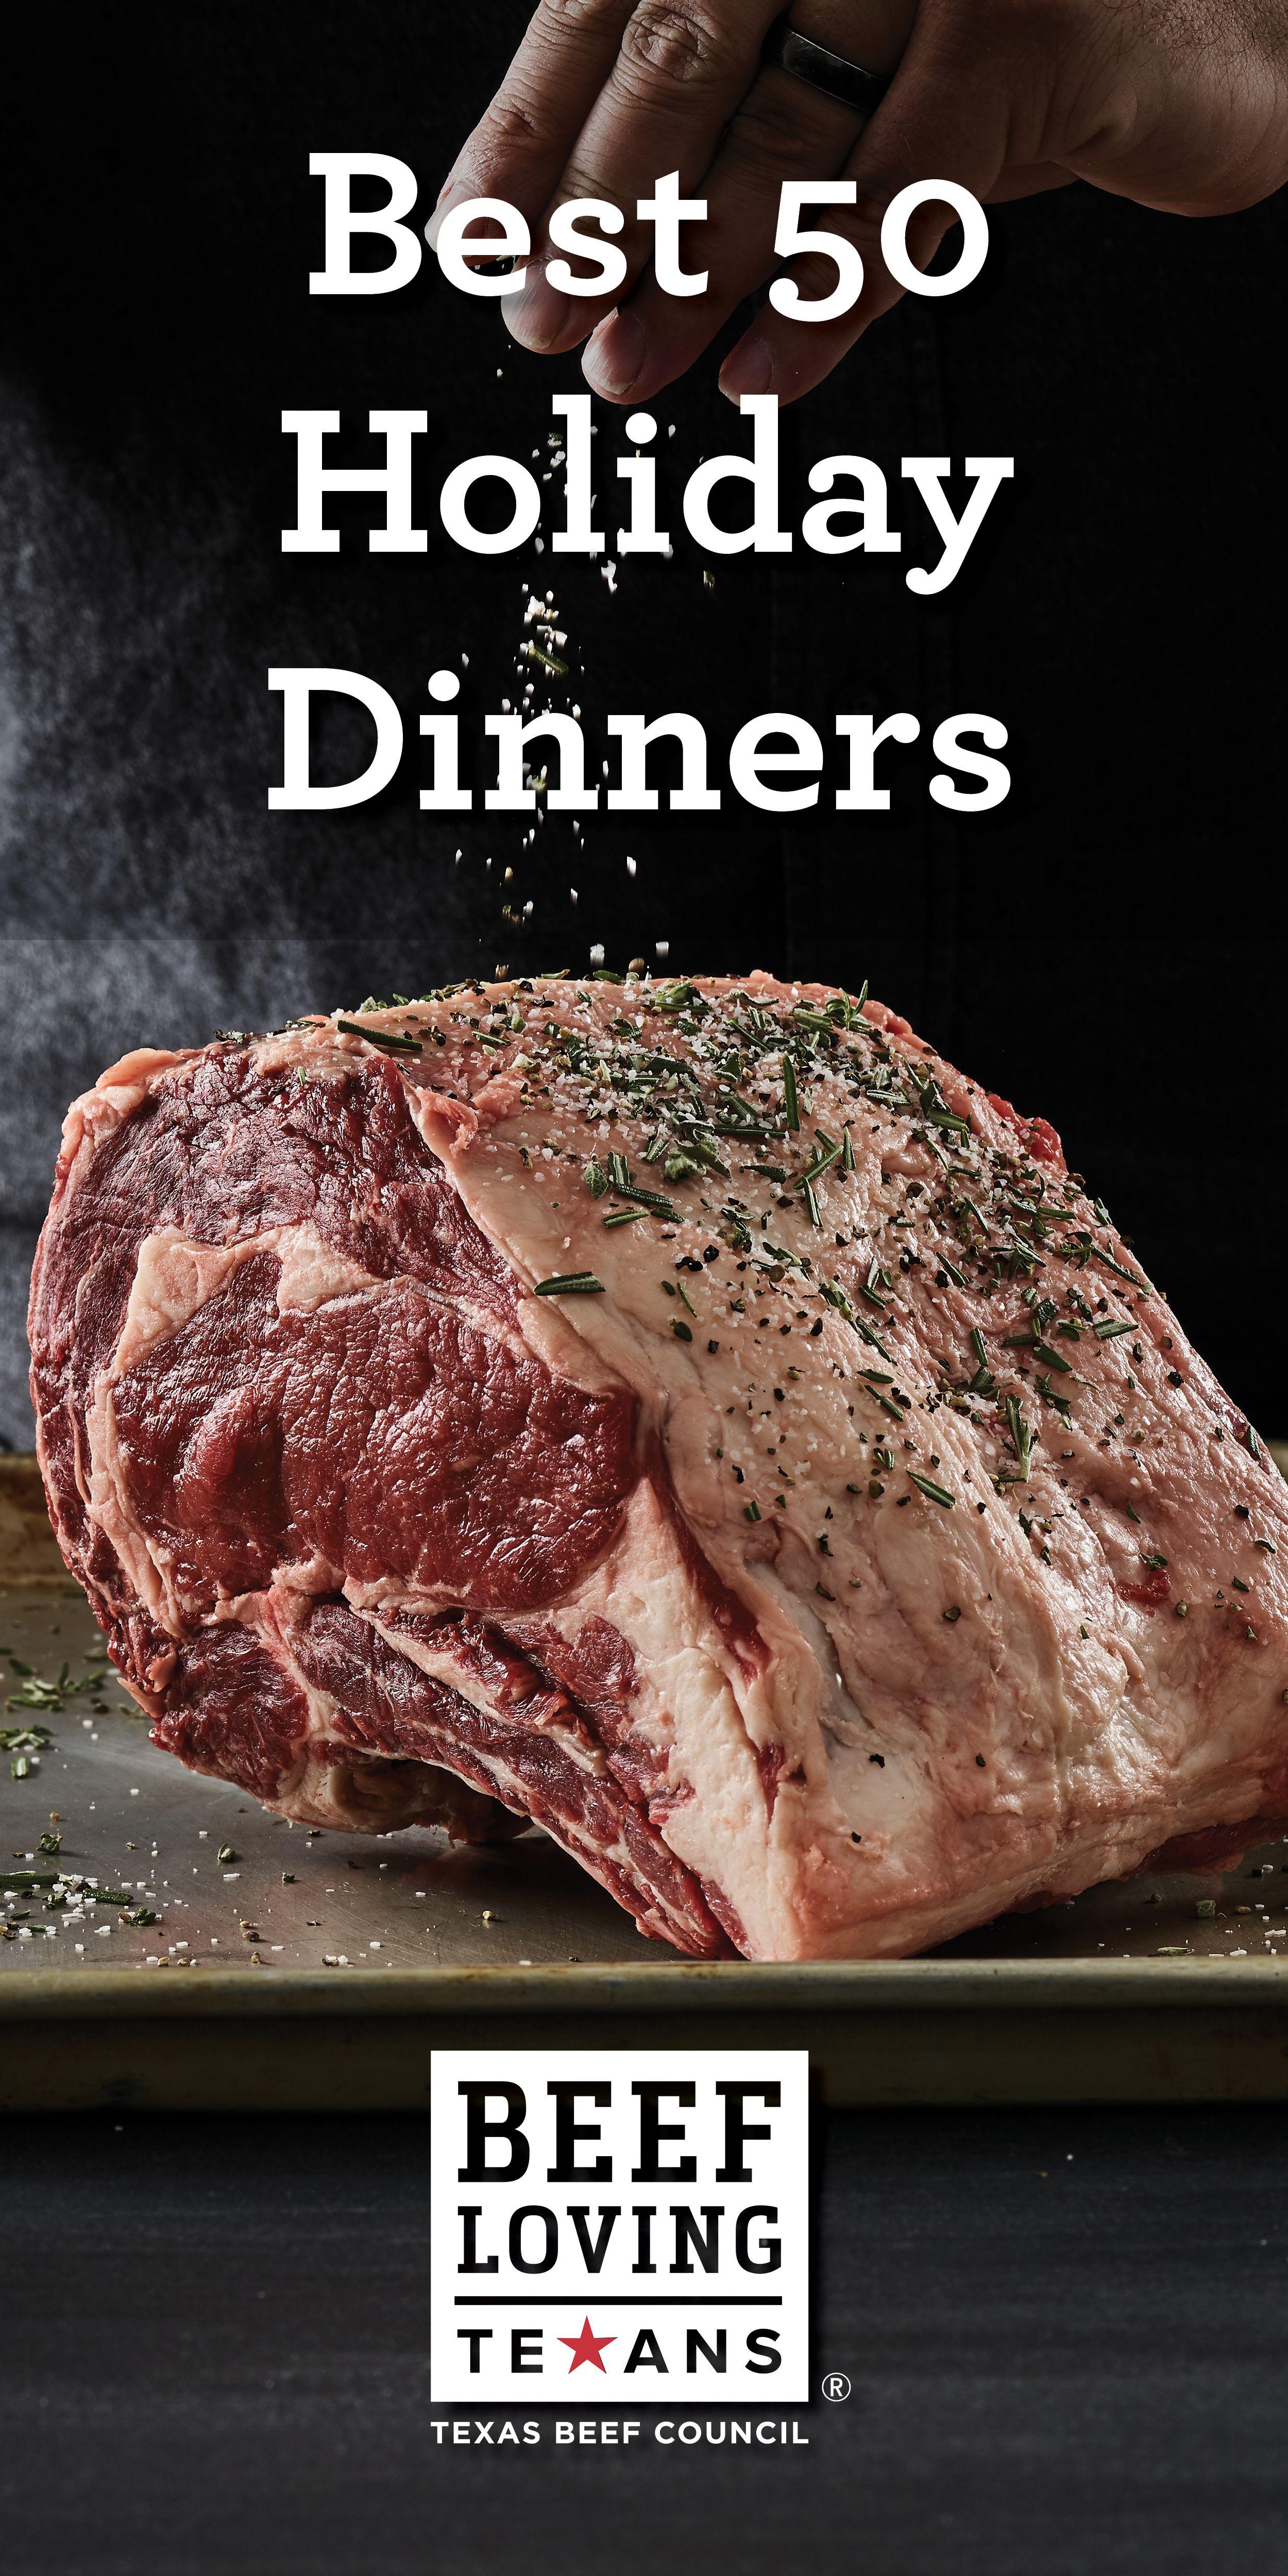 50 Holiday Recipes And Menu Ideas Holiday Dinner Holiday Dinner Recipes Holiday Recipes